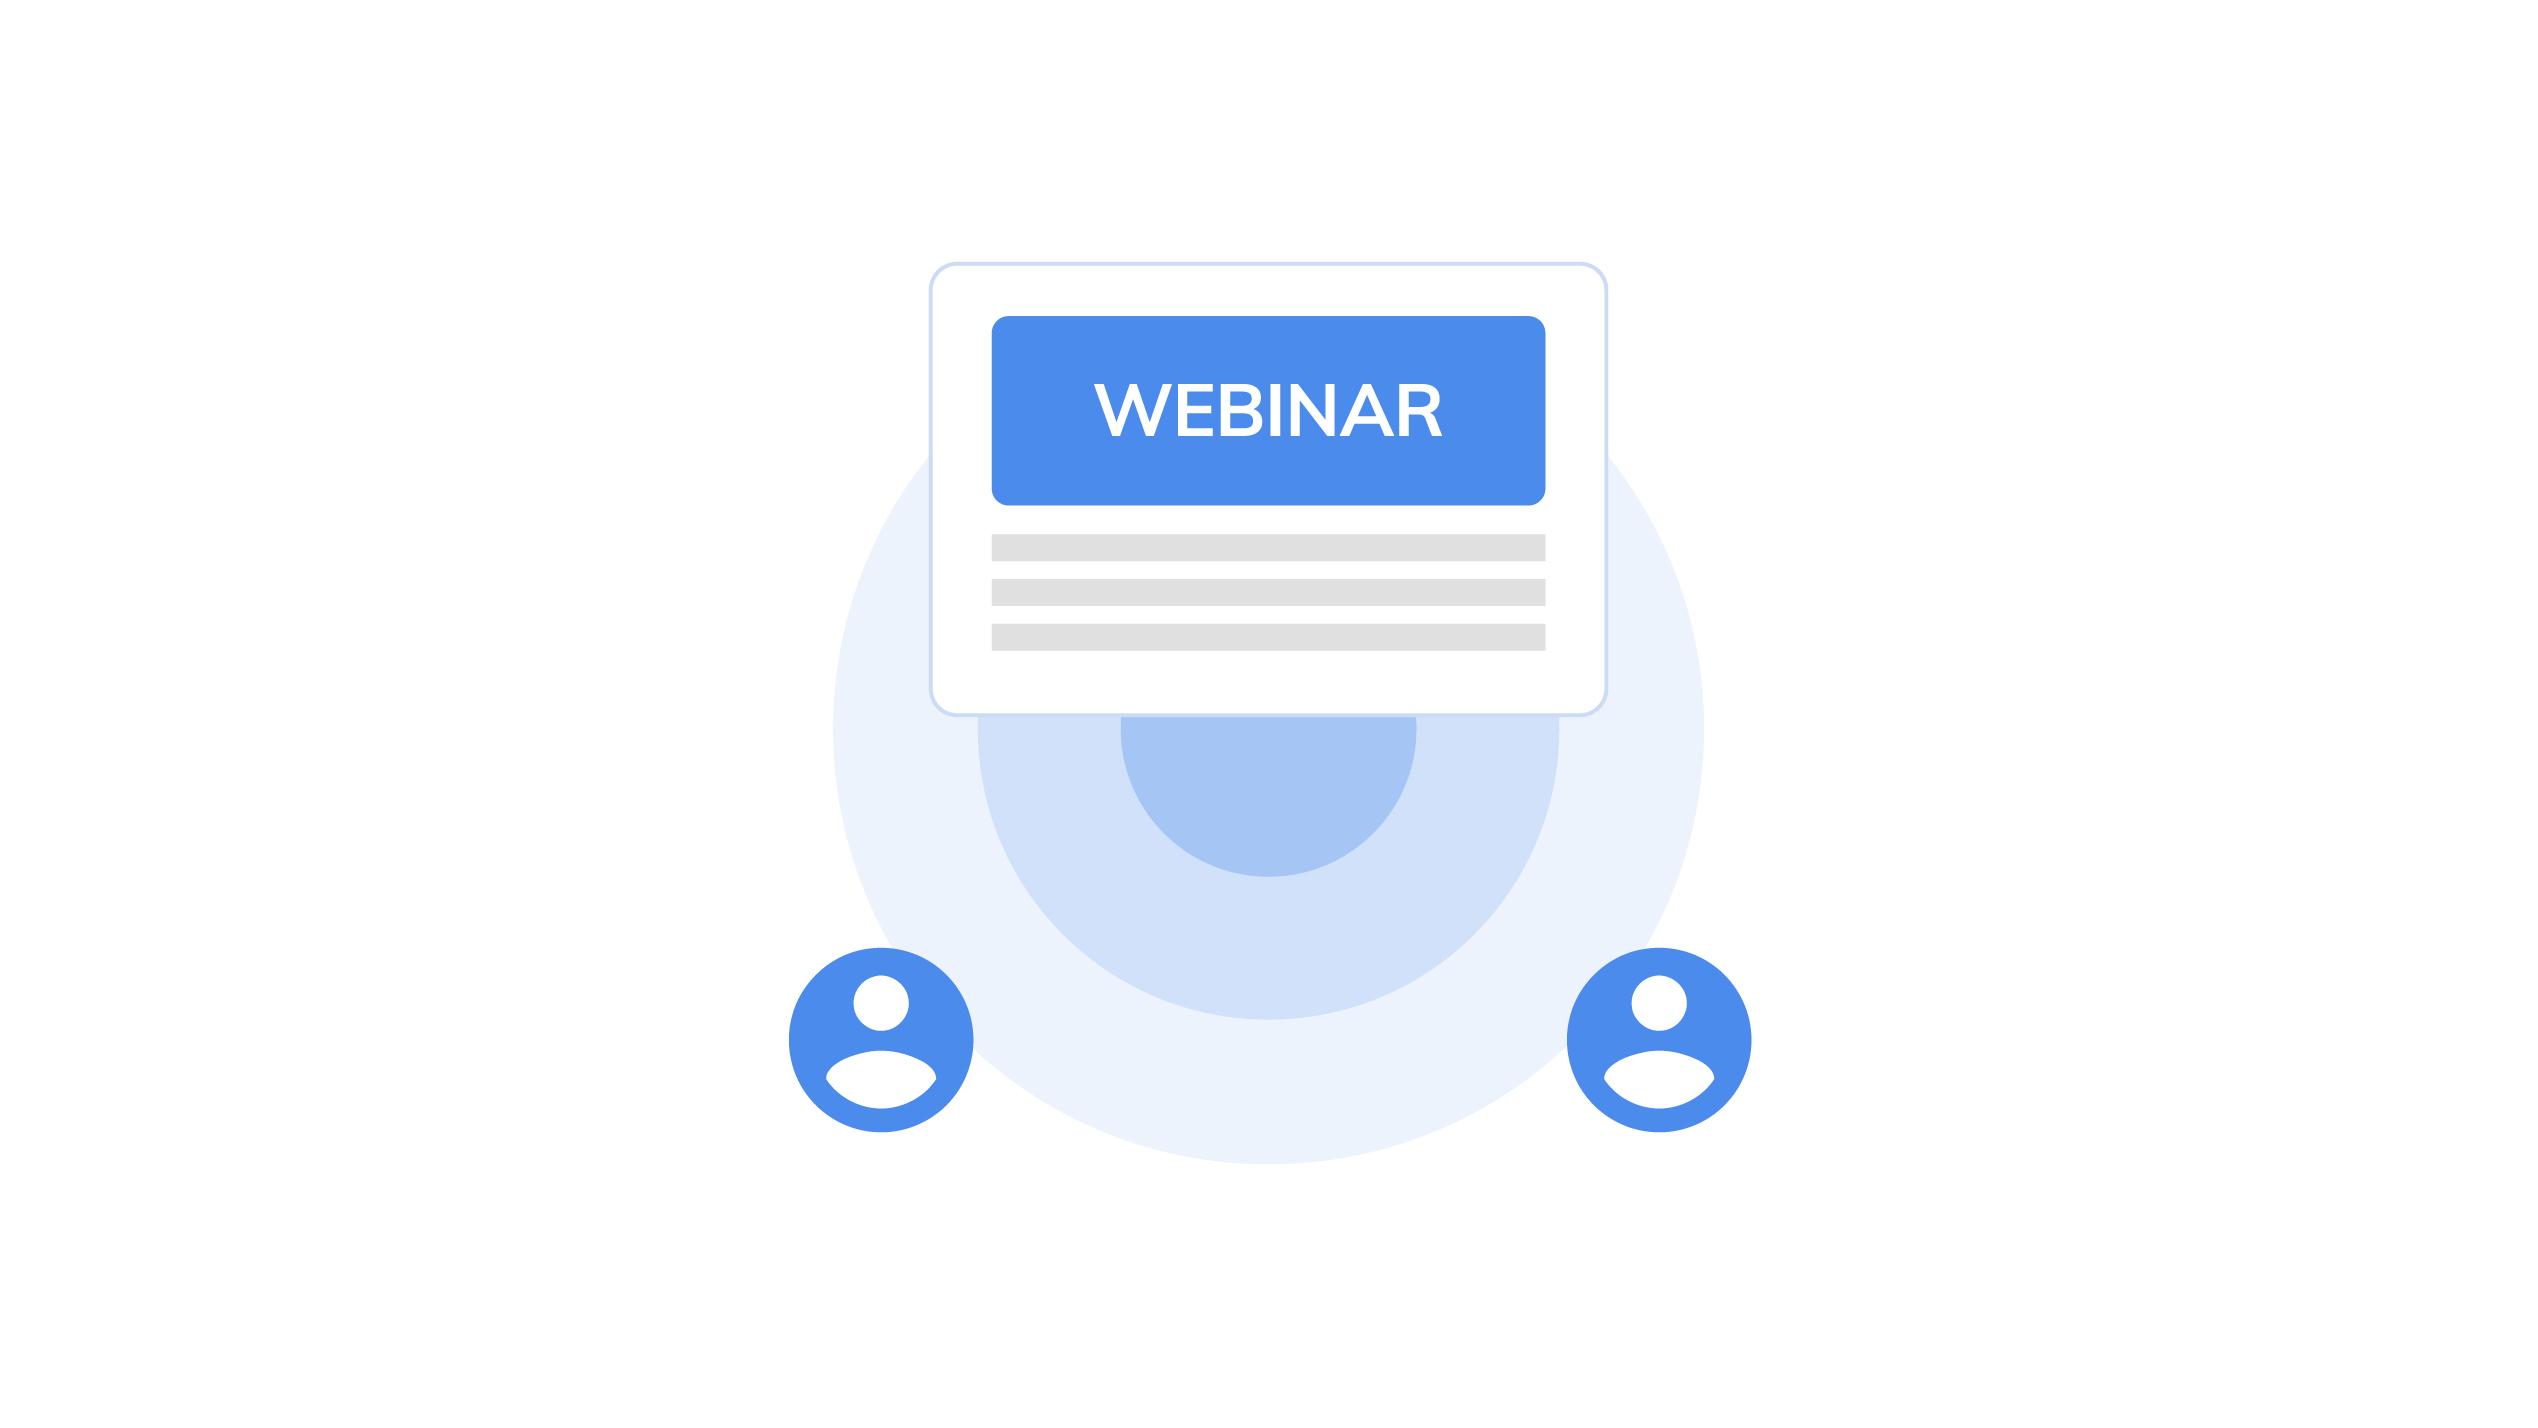 saas webinars - the ultimate guide to effective b2b saas marketing virtual events - blog image